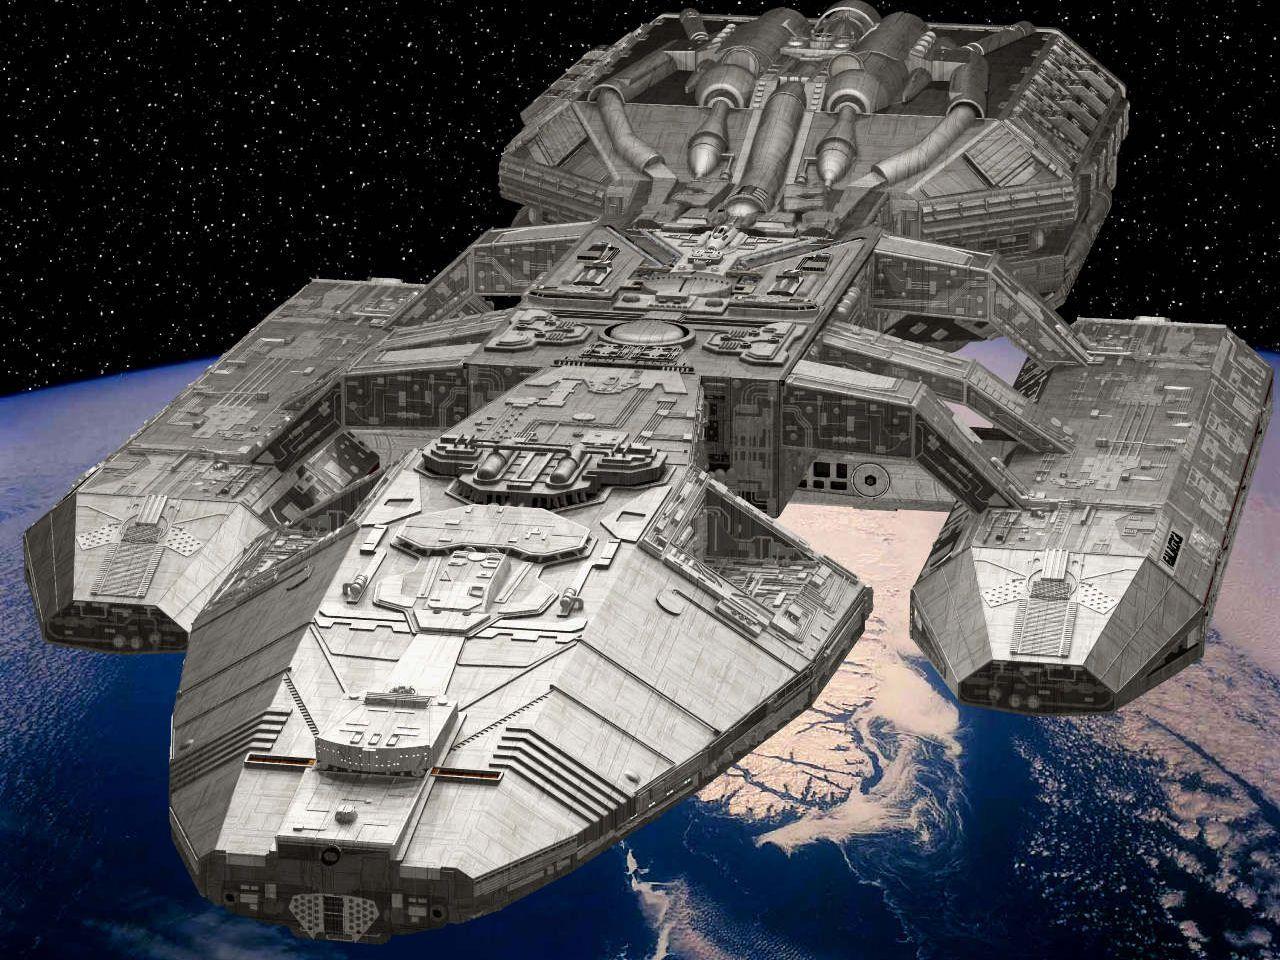 Battlestar Galactica Starships | the battlestar galactica craft colonial battlestar type colonial ...